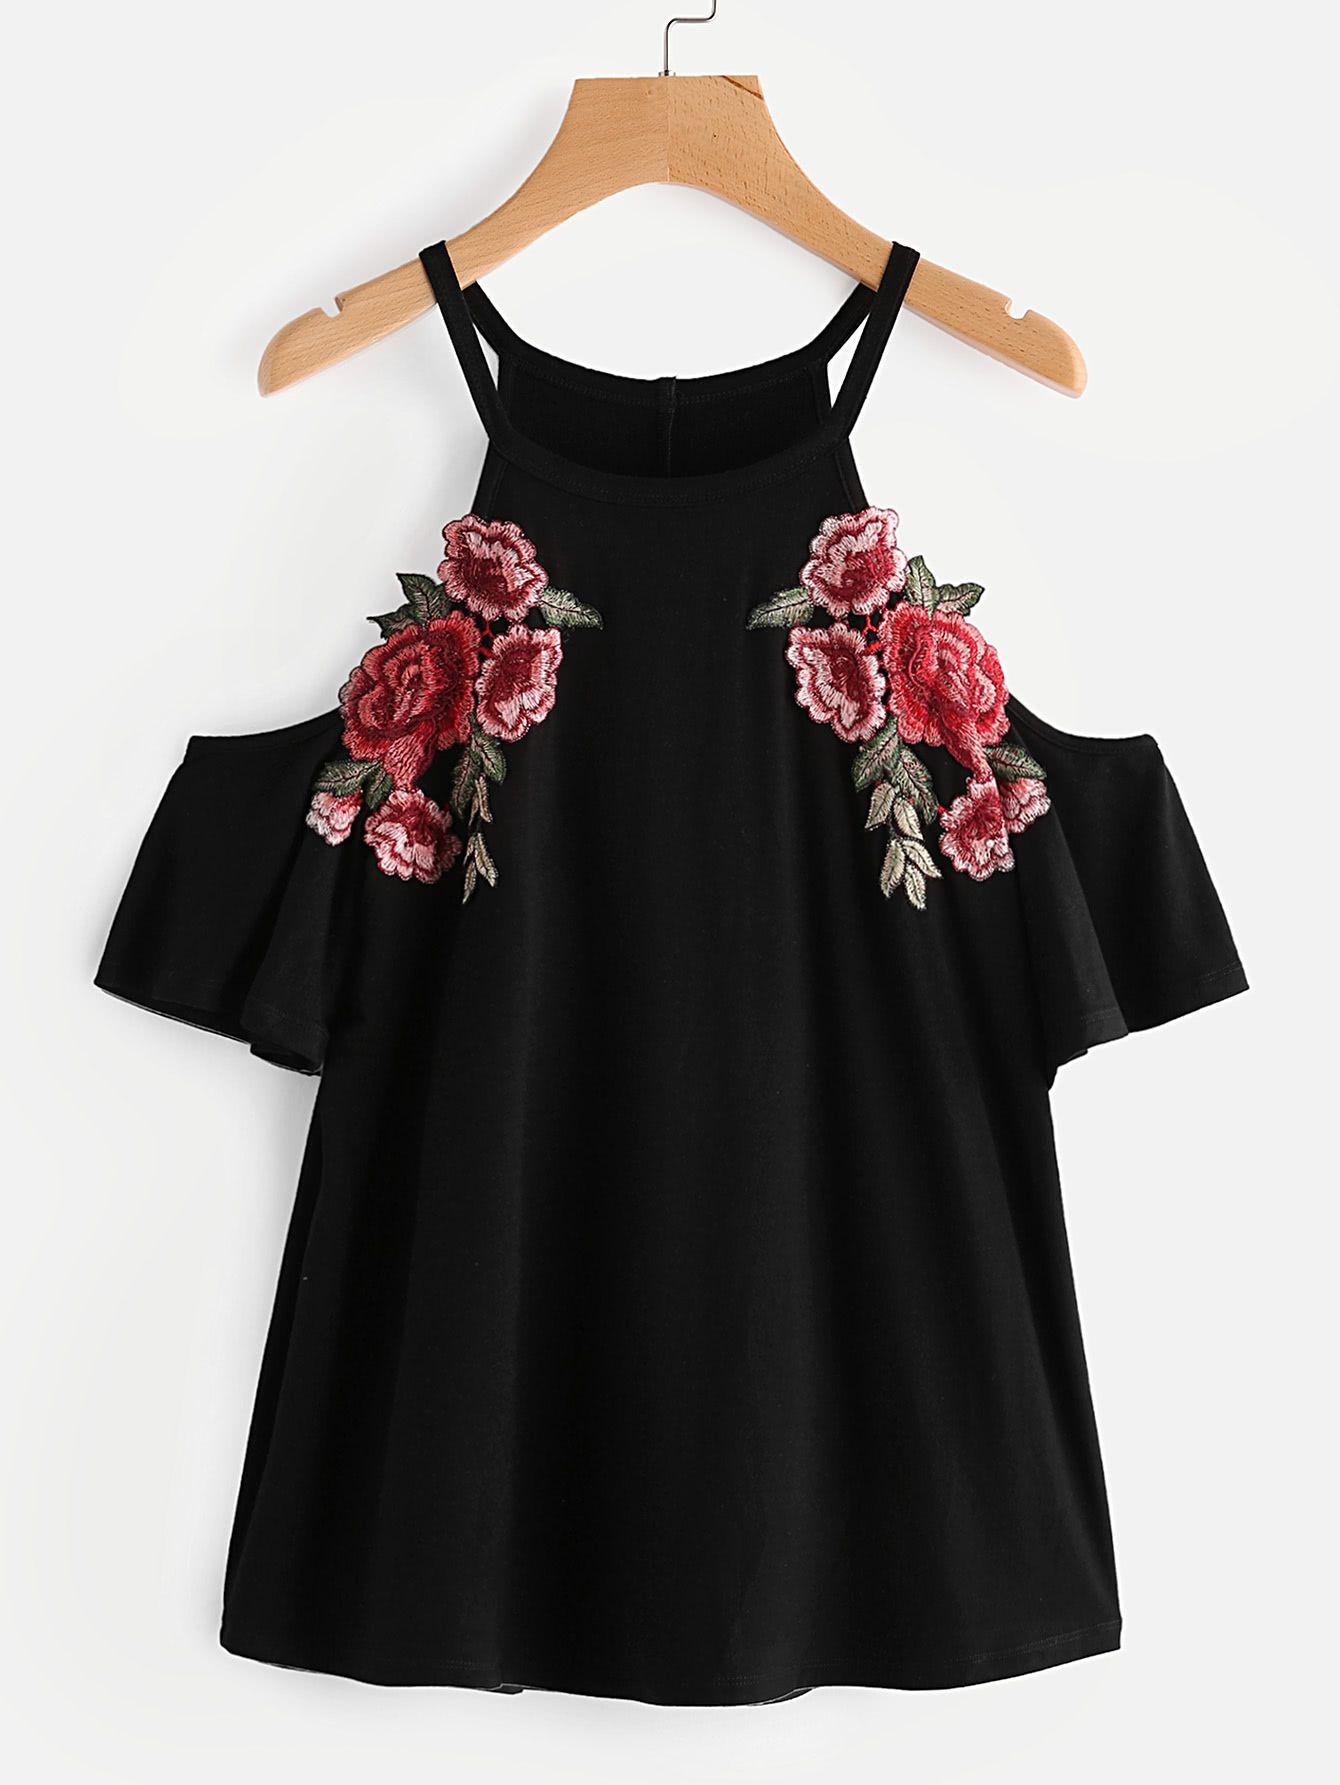 6cf5855478e85 Camiseta con hombros descubiertos y parche -Spanish SheIn(Sheinside). Shop  Embroidered Rose Patch Cold Shoulder Tee ...